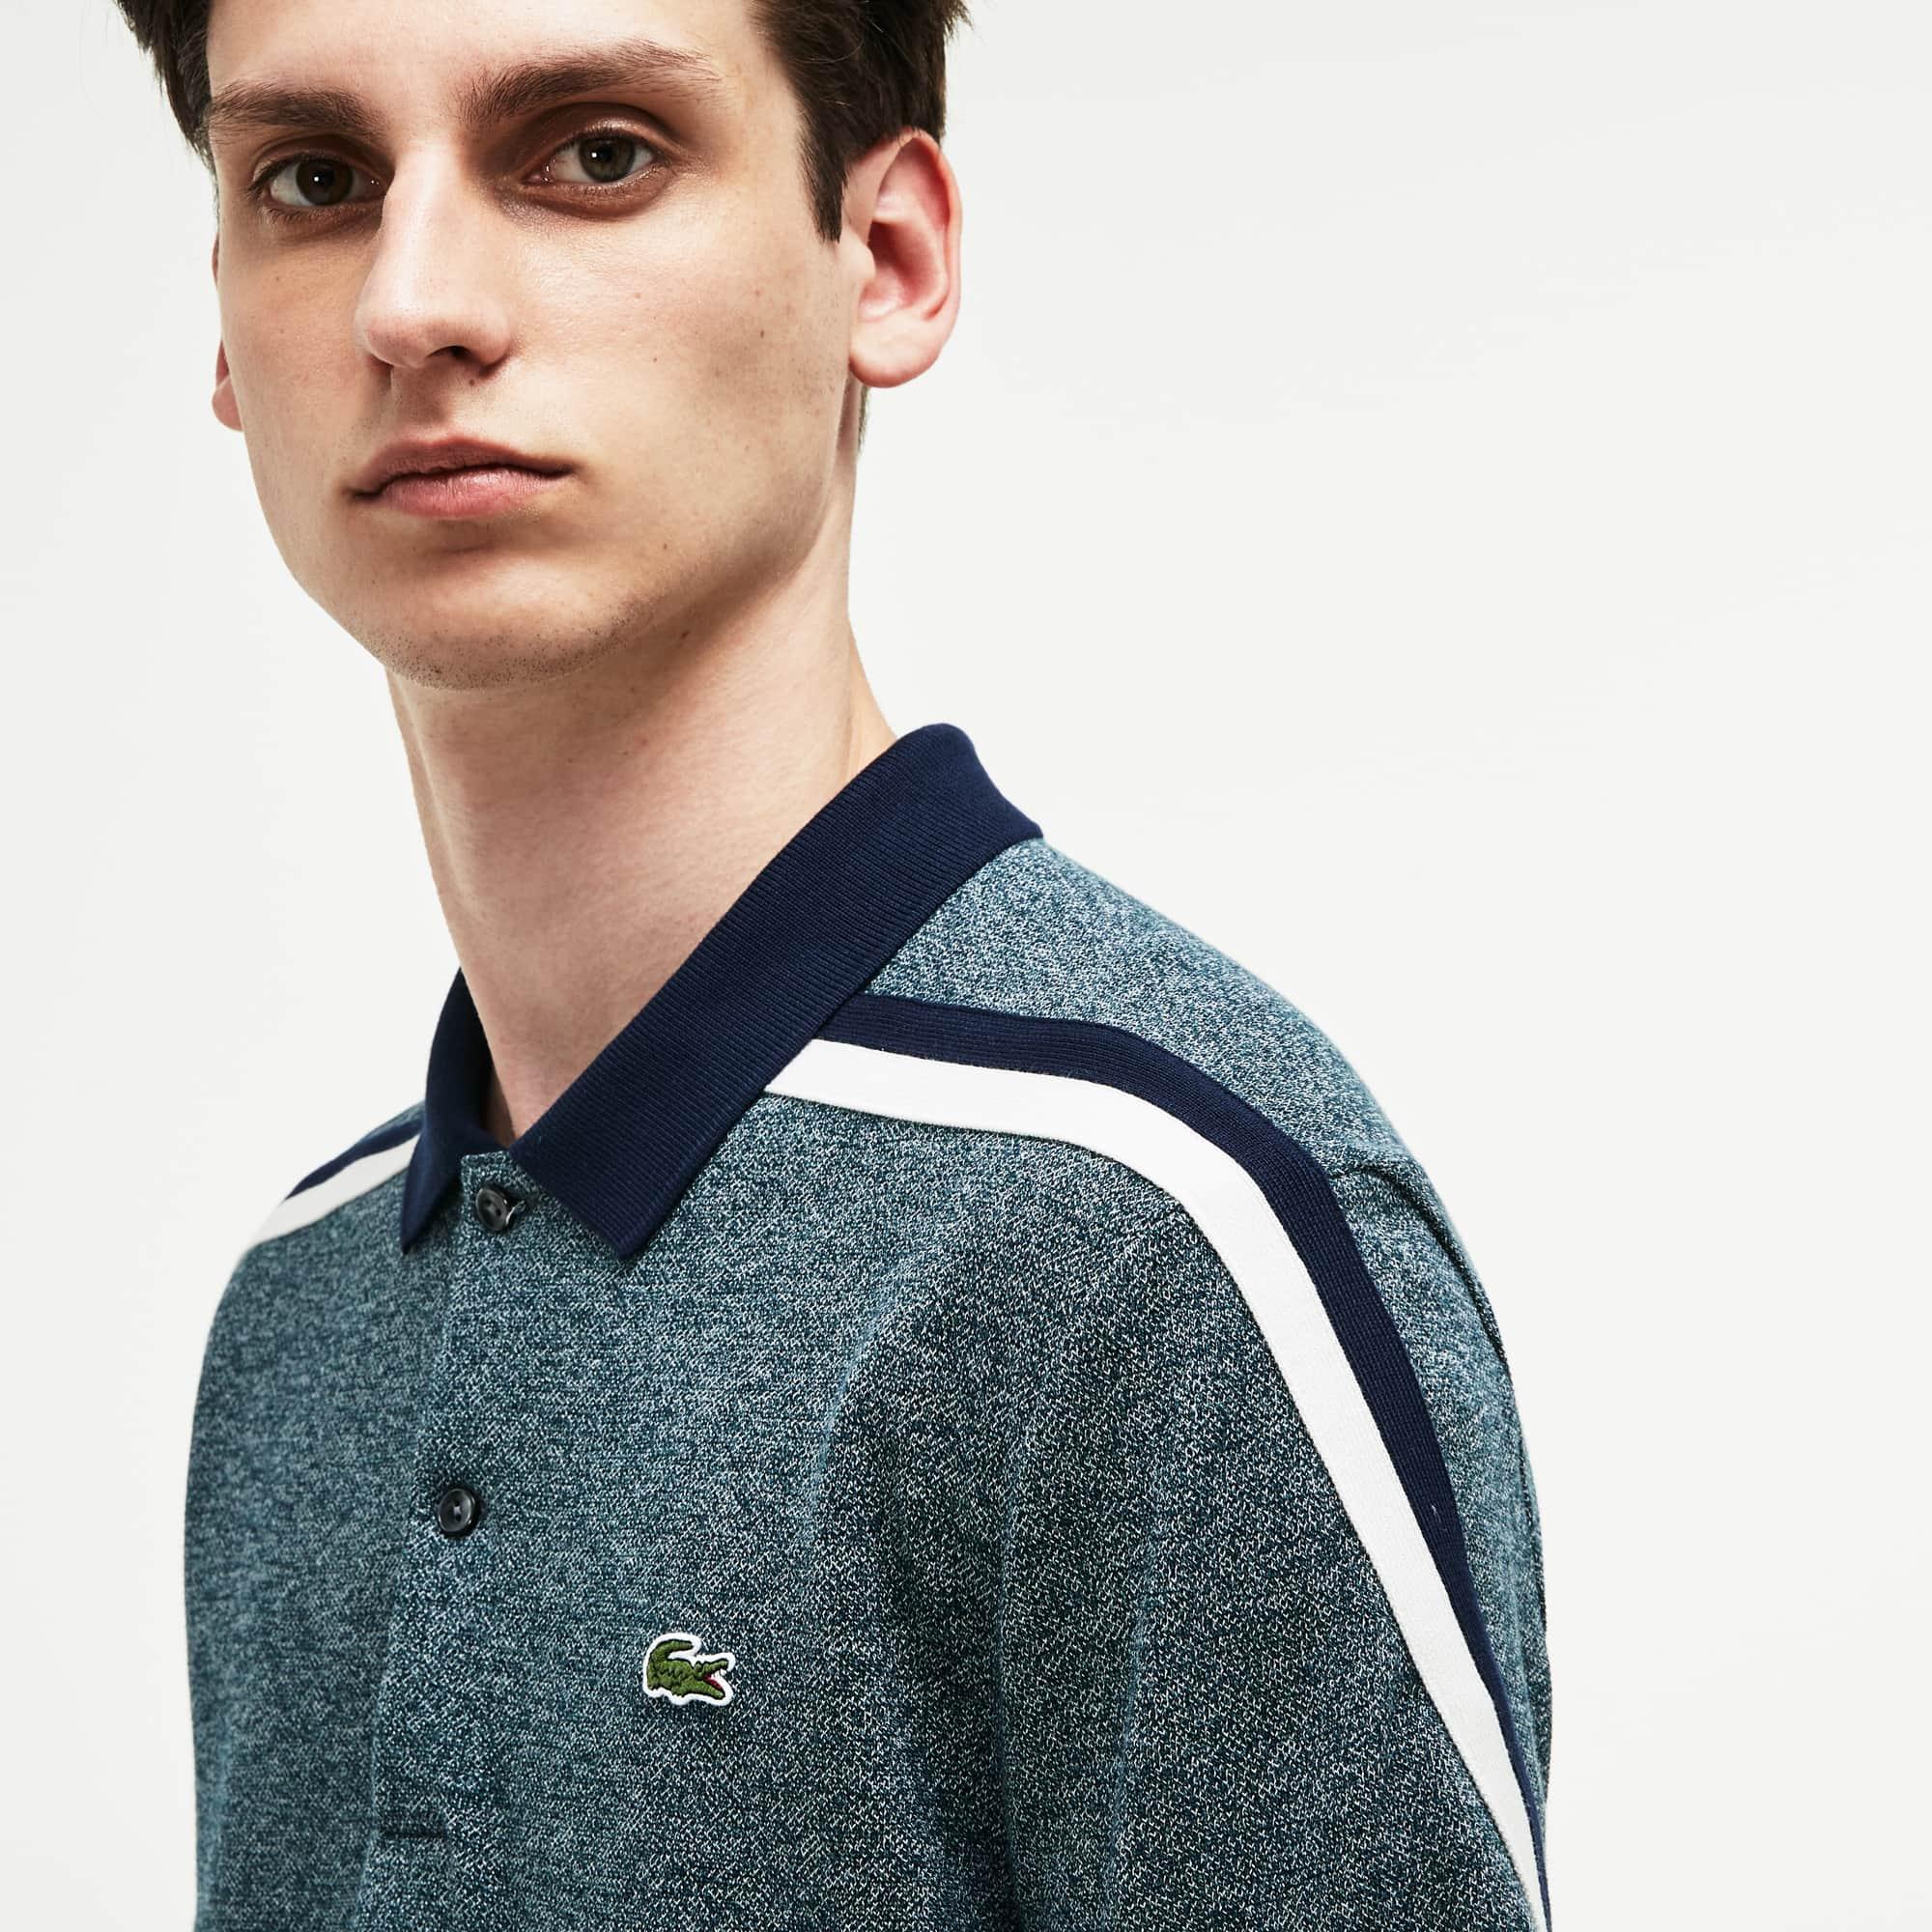 Lacoste - LACOSTE Made In France Regular Fit Herren-Poloshirt aus Baumwoll-Piqué - 1